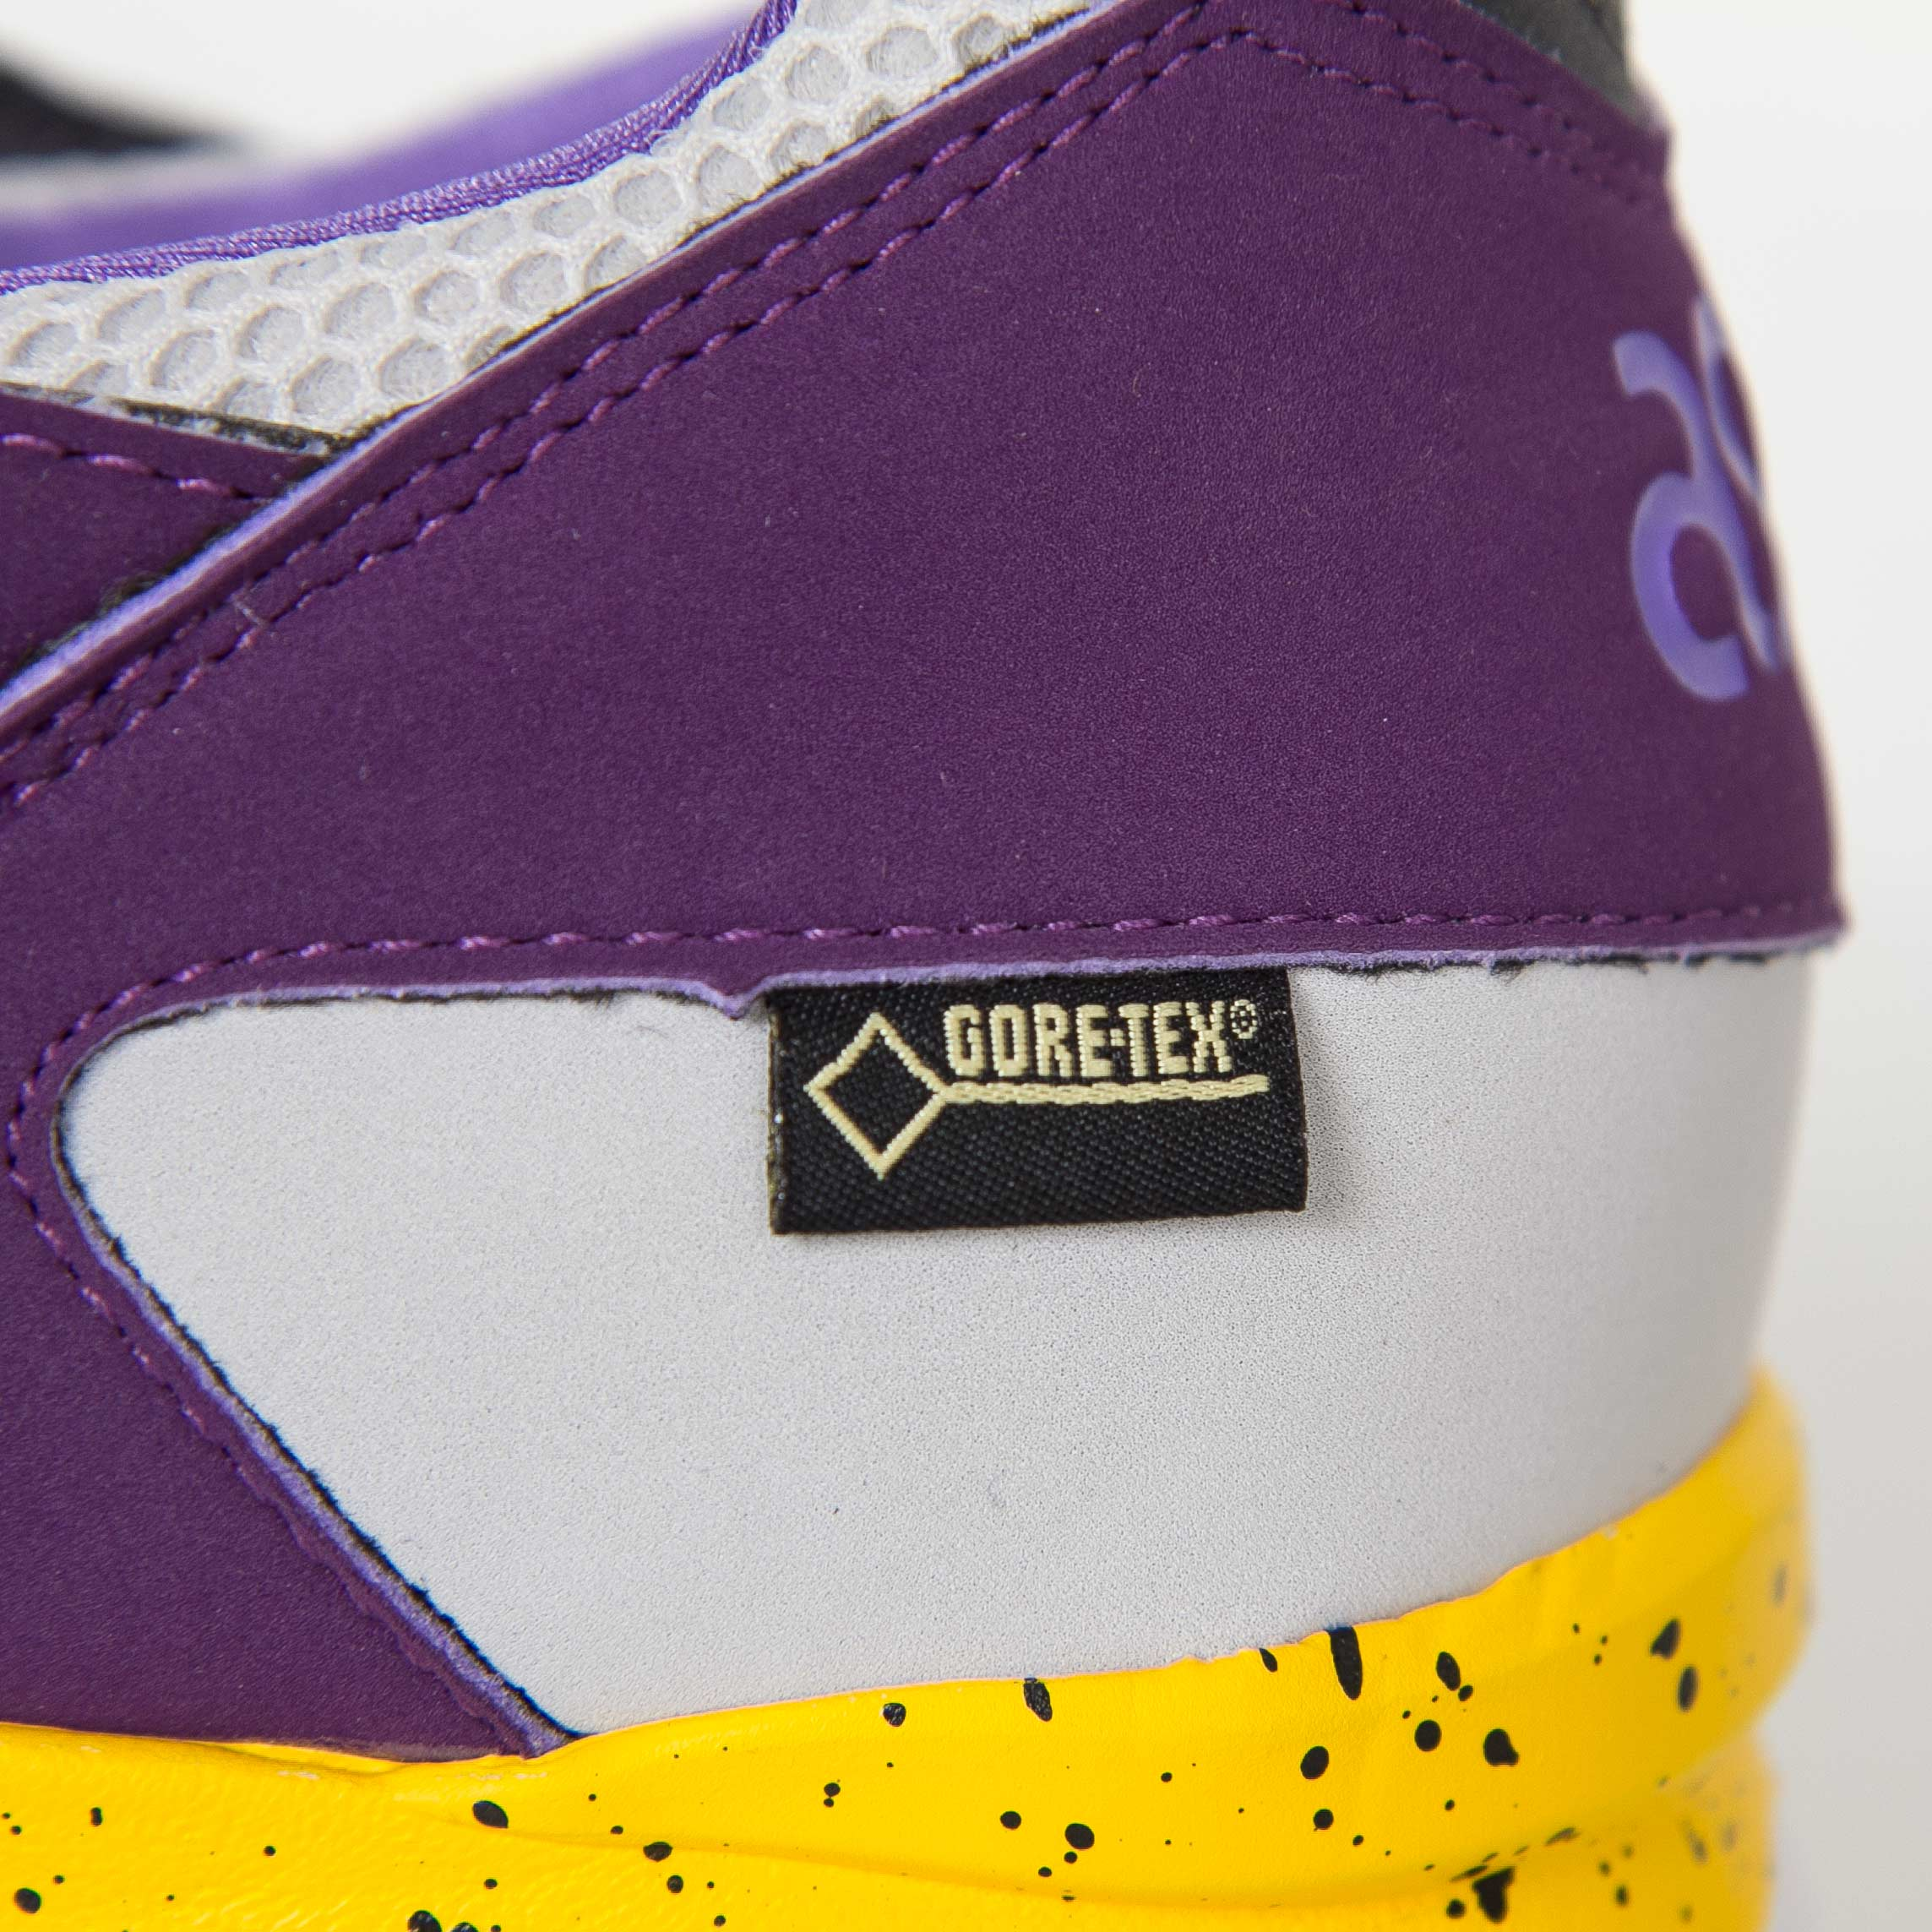 nouveau produit 011db 3a1f4 ASICS Tiger Gel-Lyte V - H429y-1041 - Sneakersnstuff ...